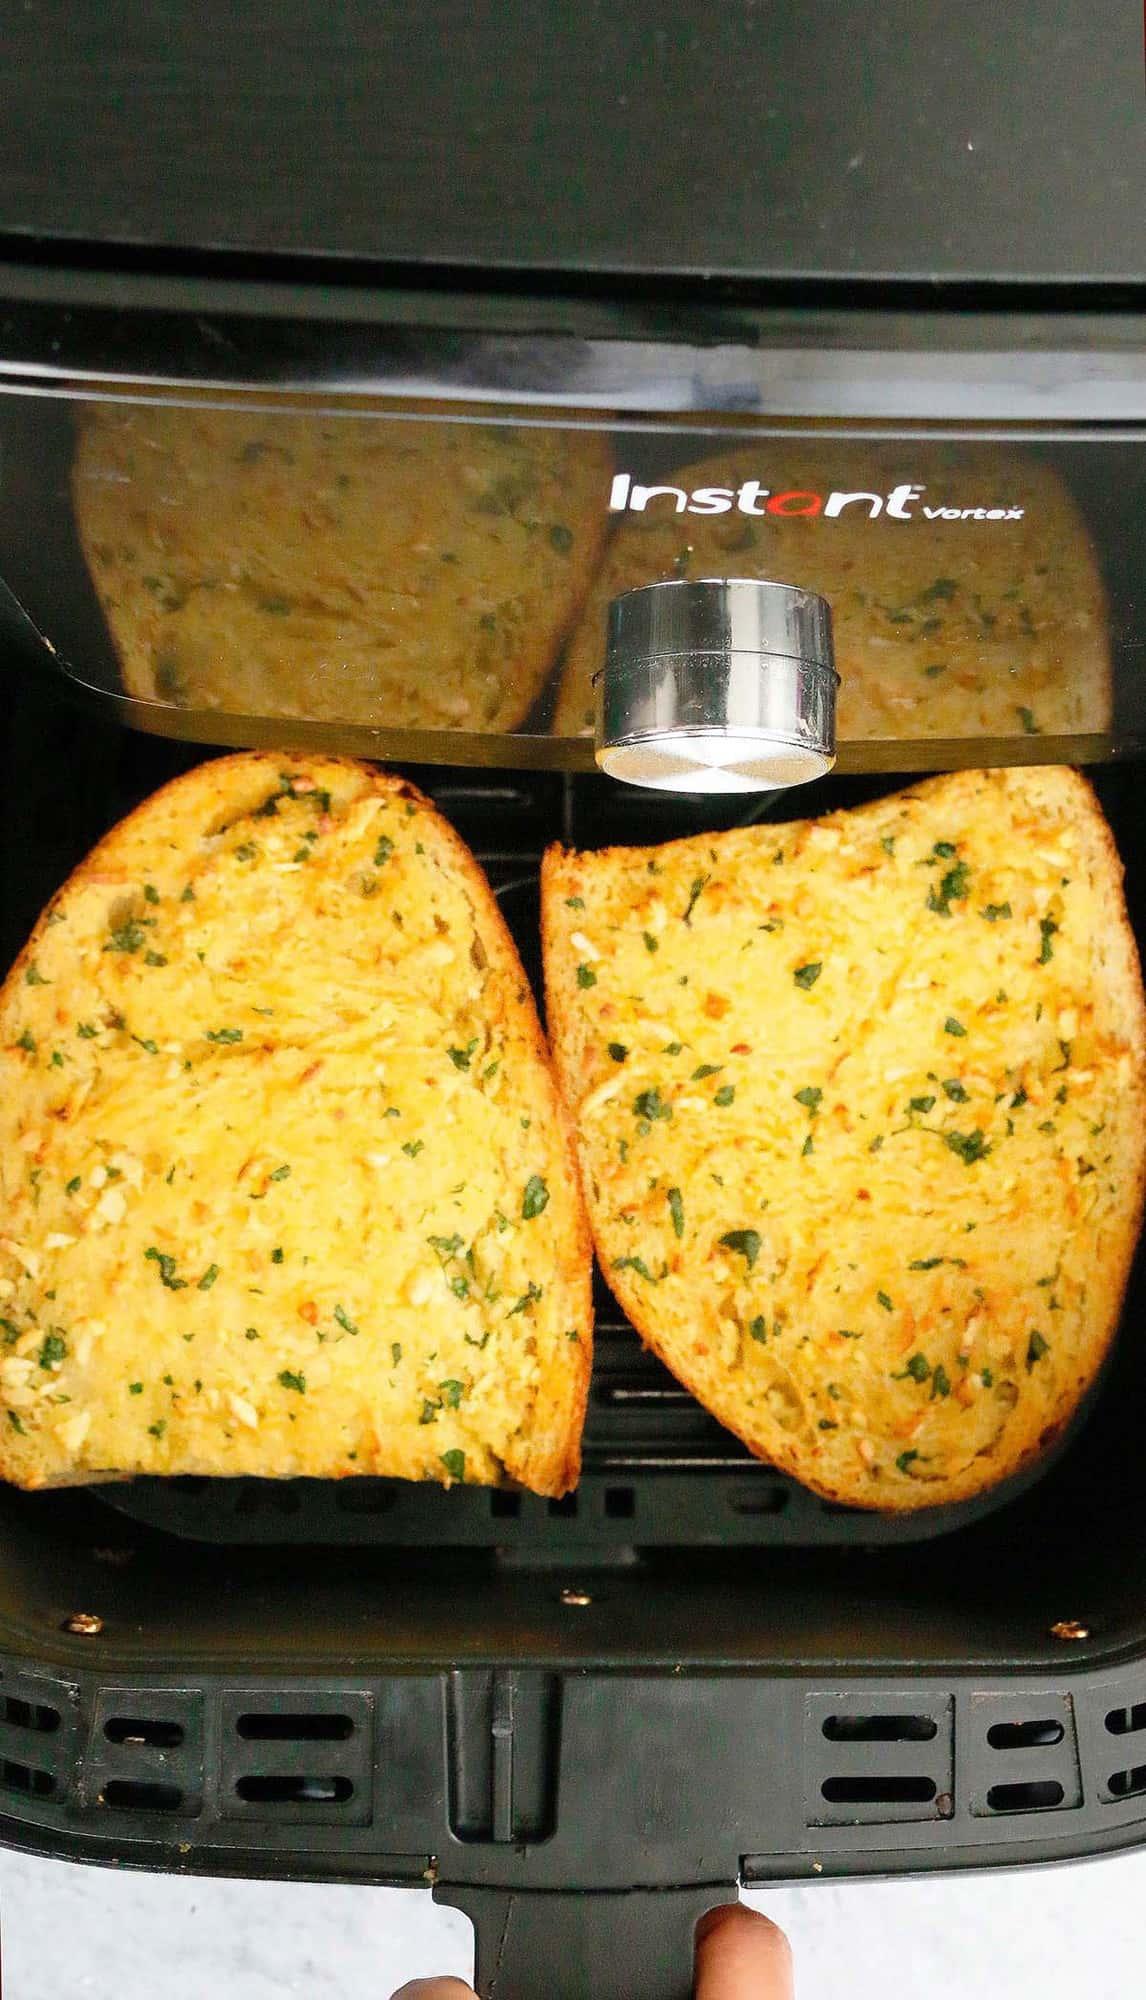 air fryer with hot crusty bread